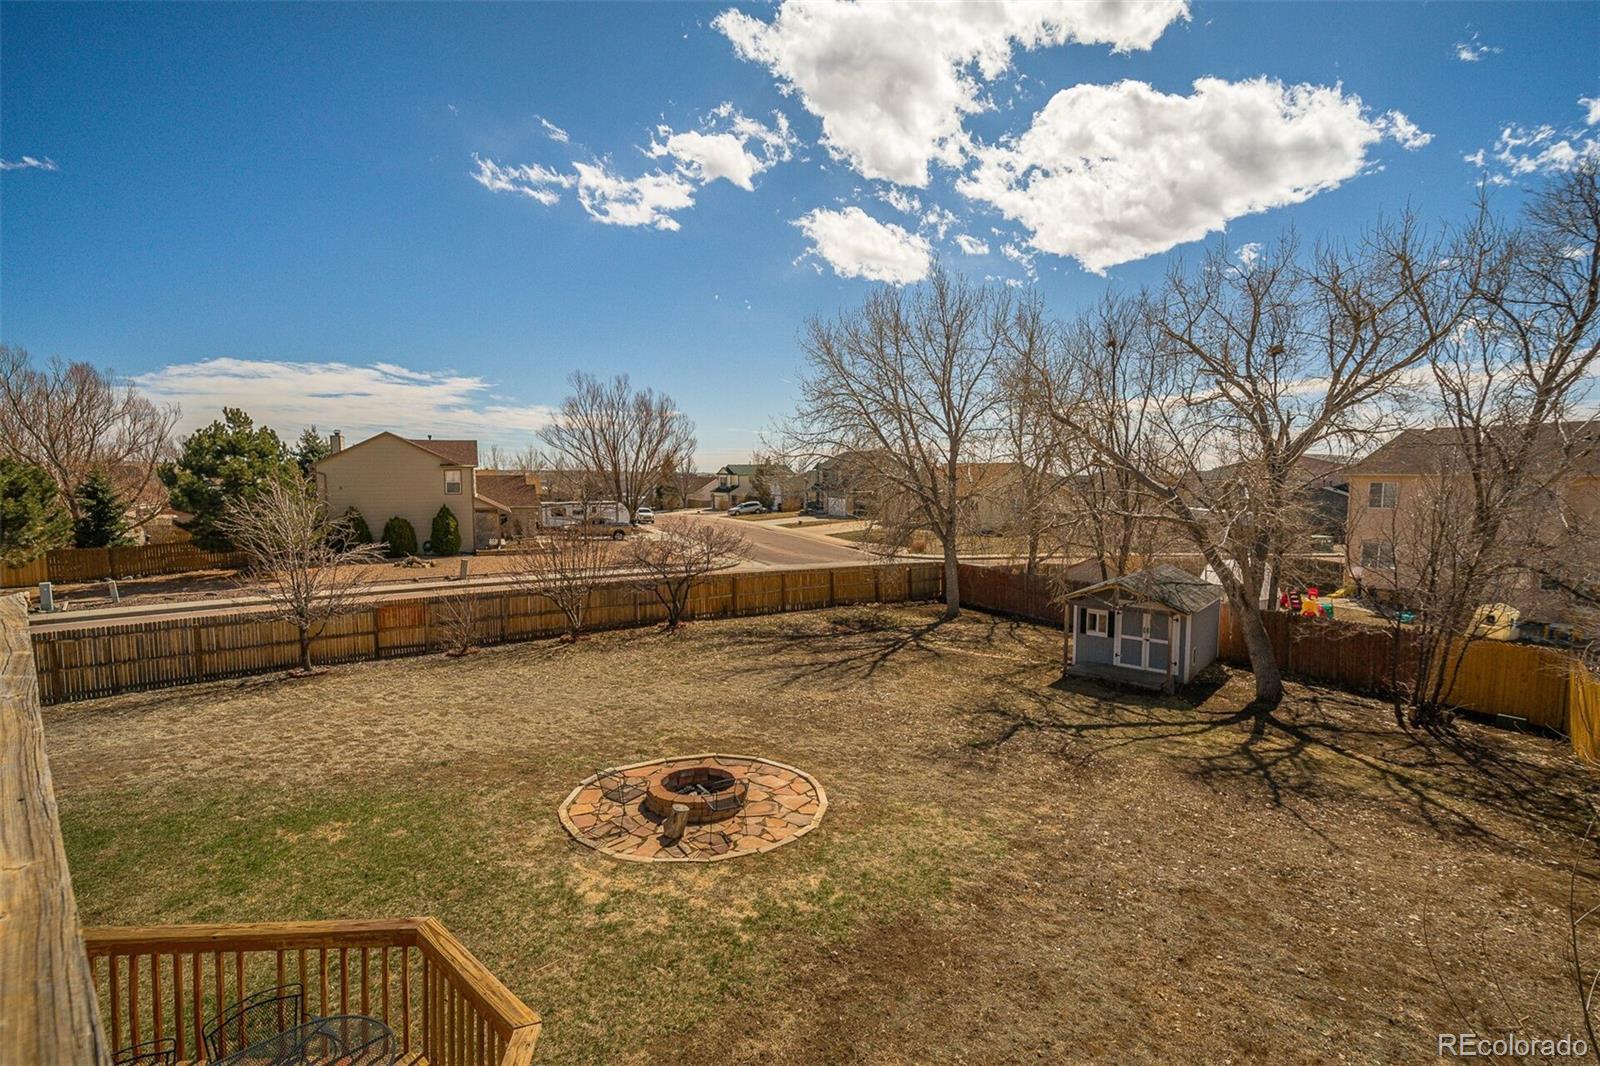 MLS# 8425770 - 27 - 6925 Battle Mountain Road, Colorado Springs, CO 80922